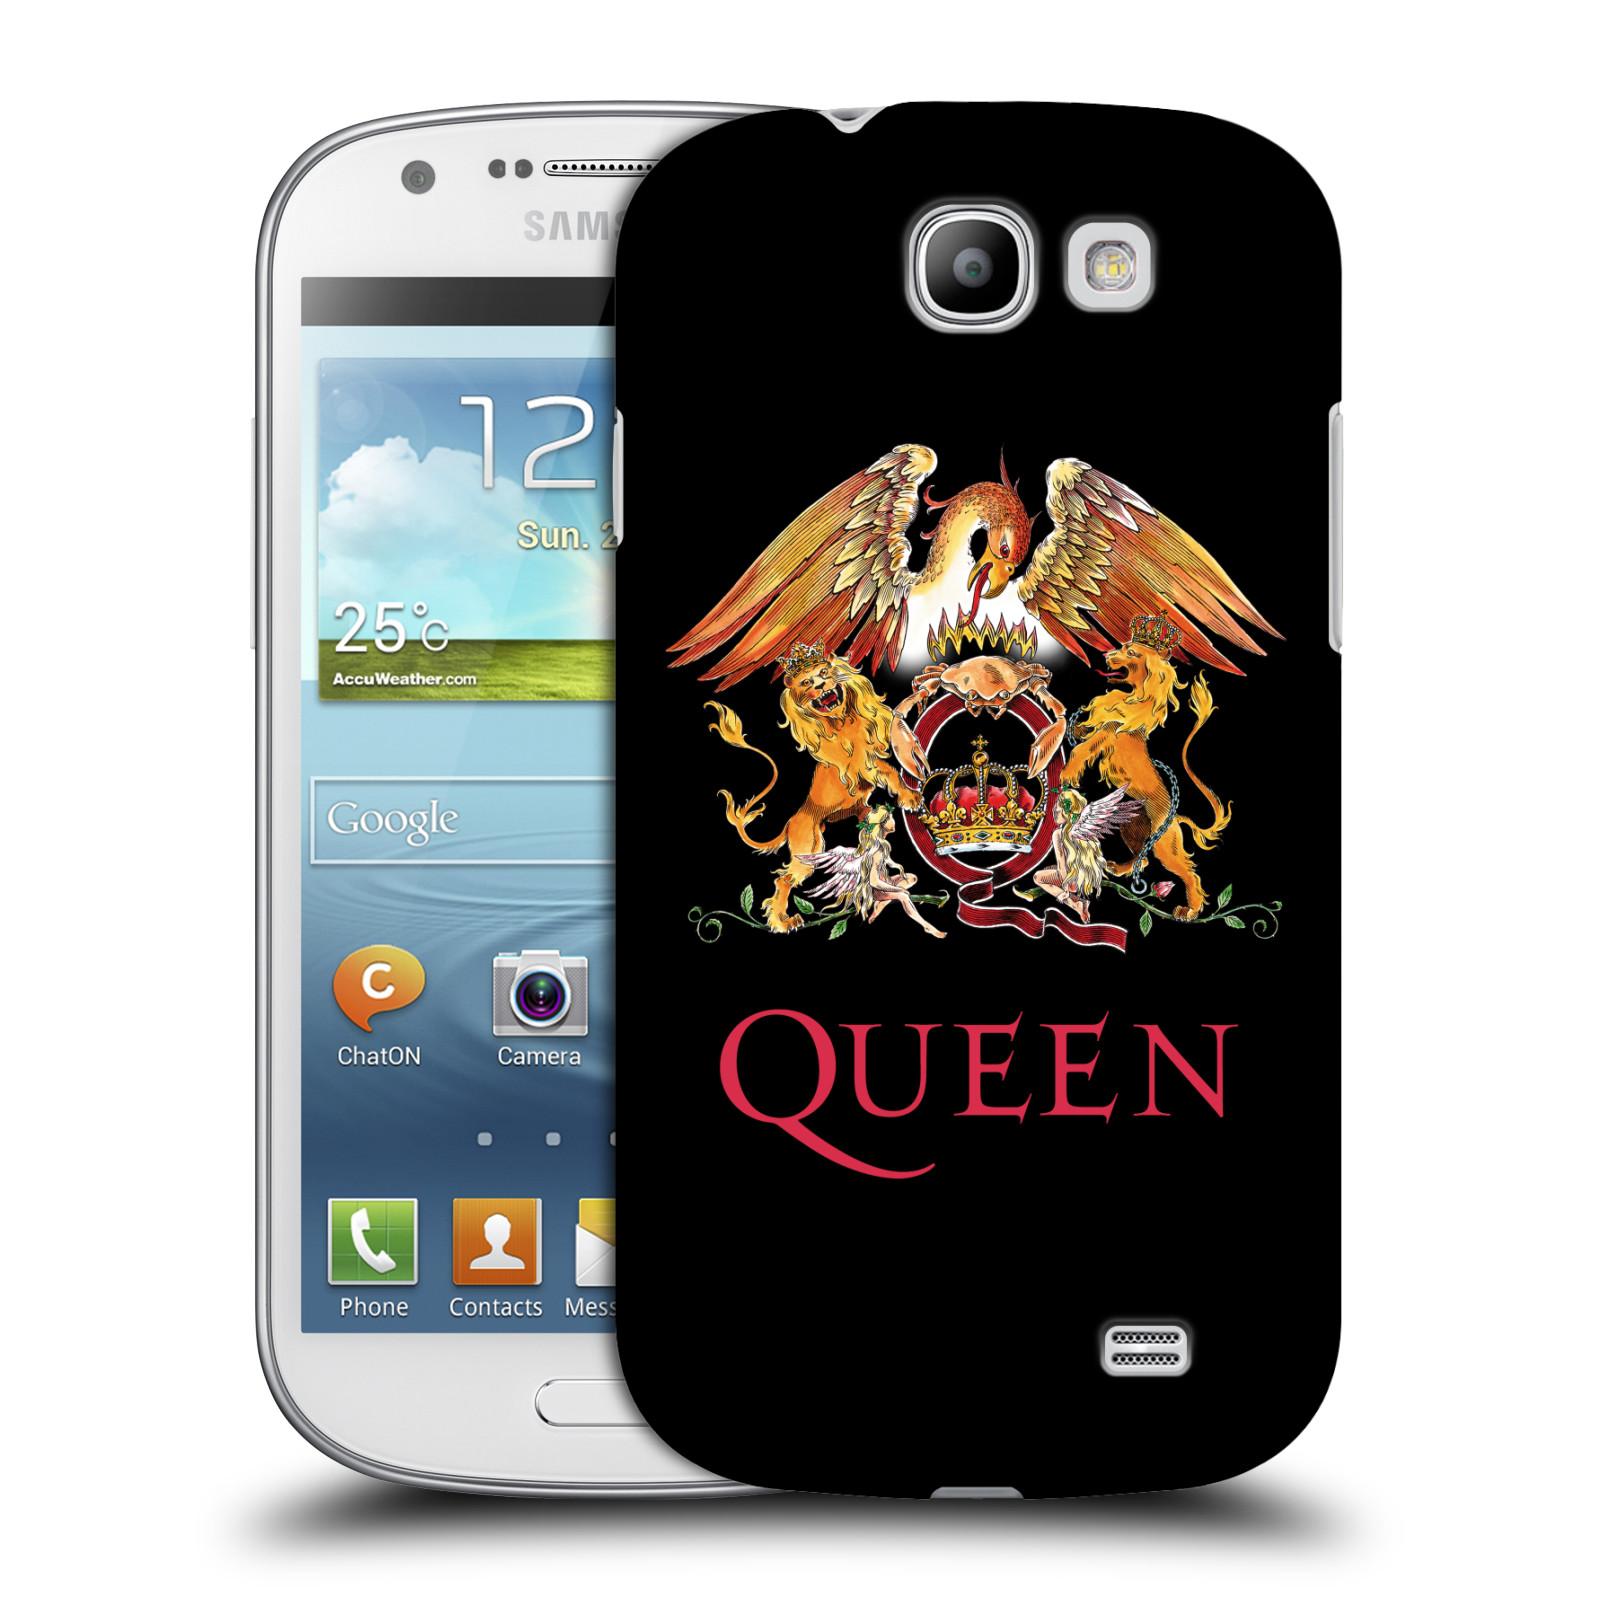 Plastové pouzdro na mobil Samsung Galaxy Express HEAD CASE Queen - Logo (Plastový kryt či obal na mobilní telefon licencovaným motivem Queen pro Samsung Galaxy Express GT-i8730)